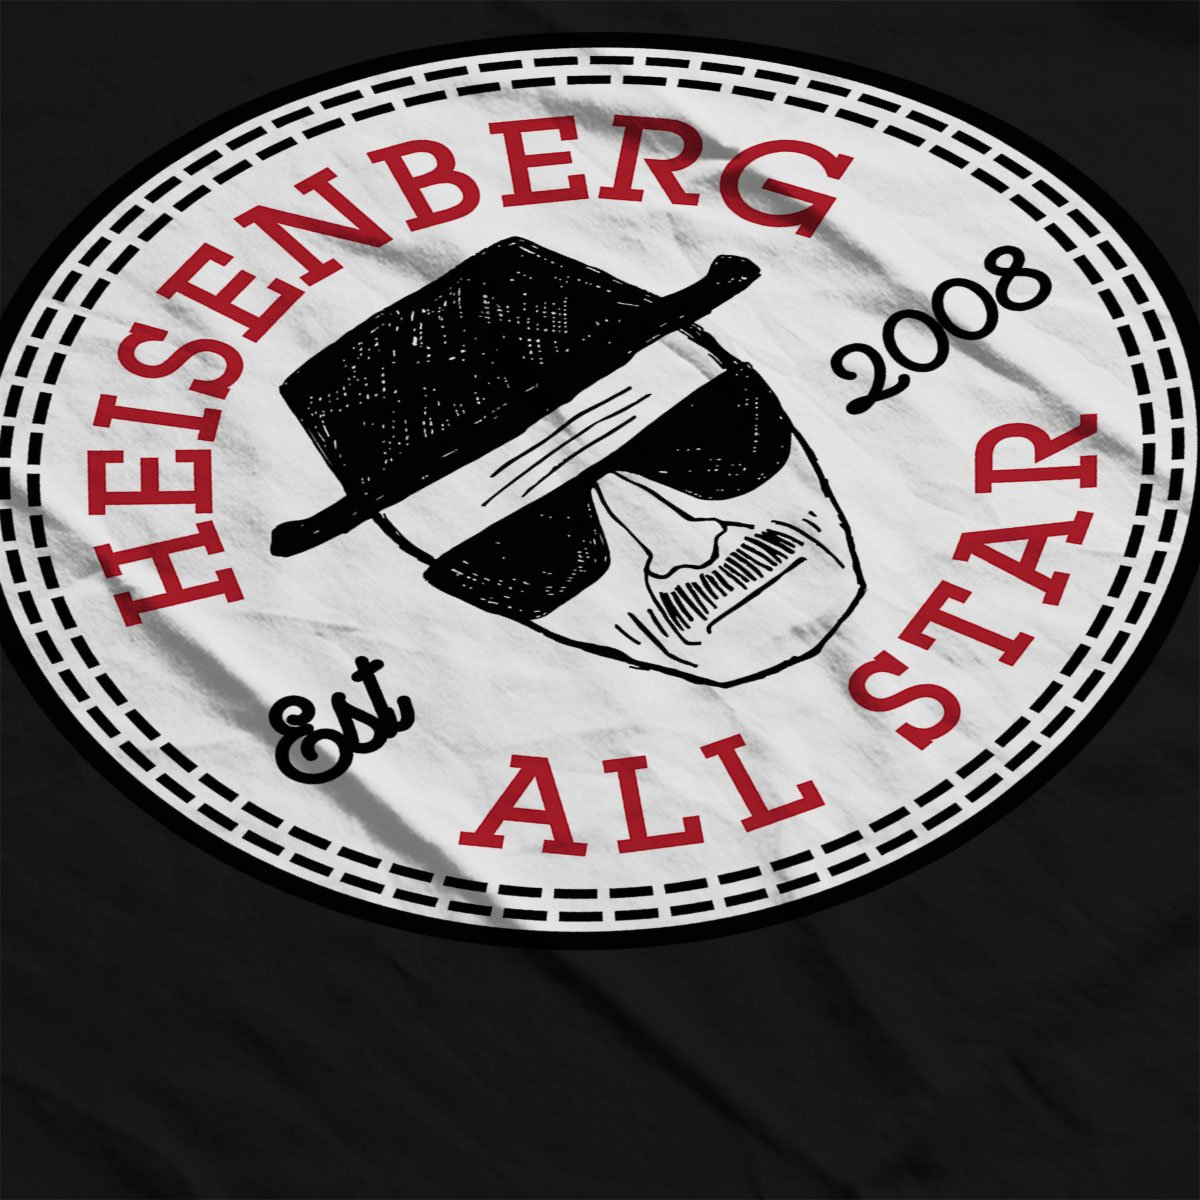 Breaking Bad Heisenberg All Star Converse Logo